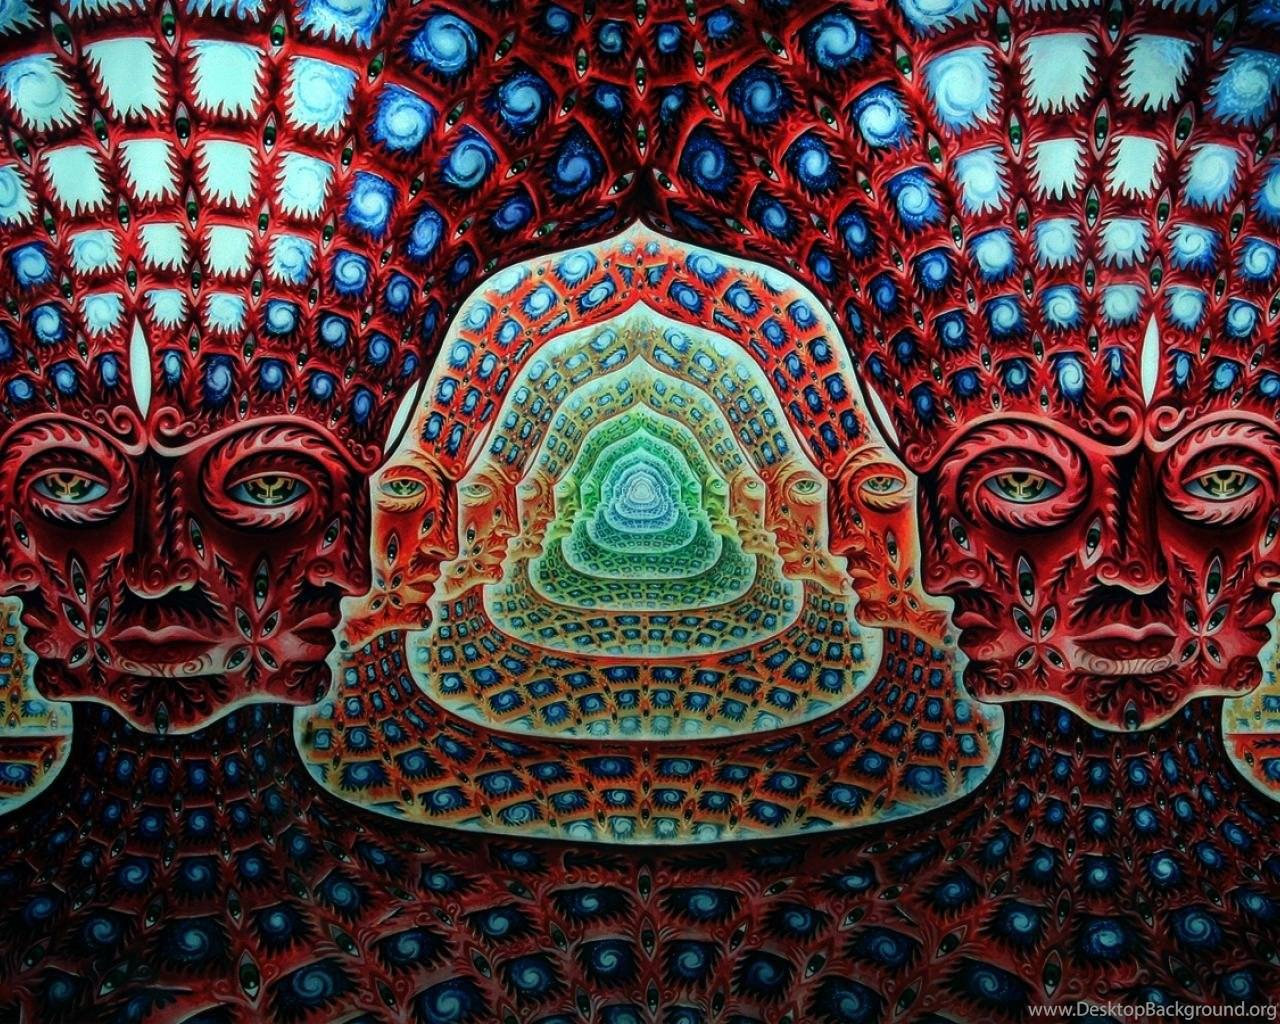 Trippy Alex Grey Wallpapers Desktop Background